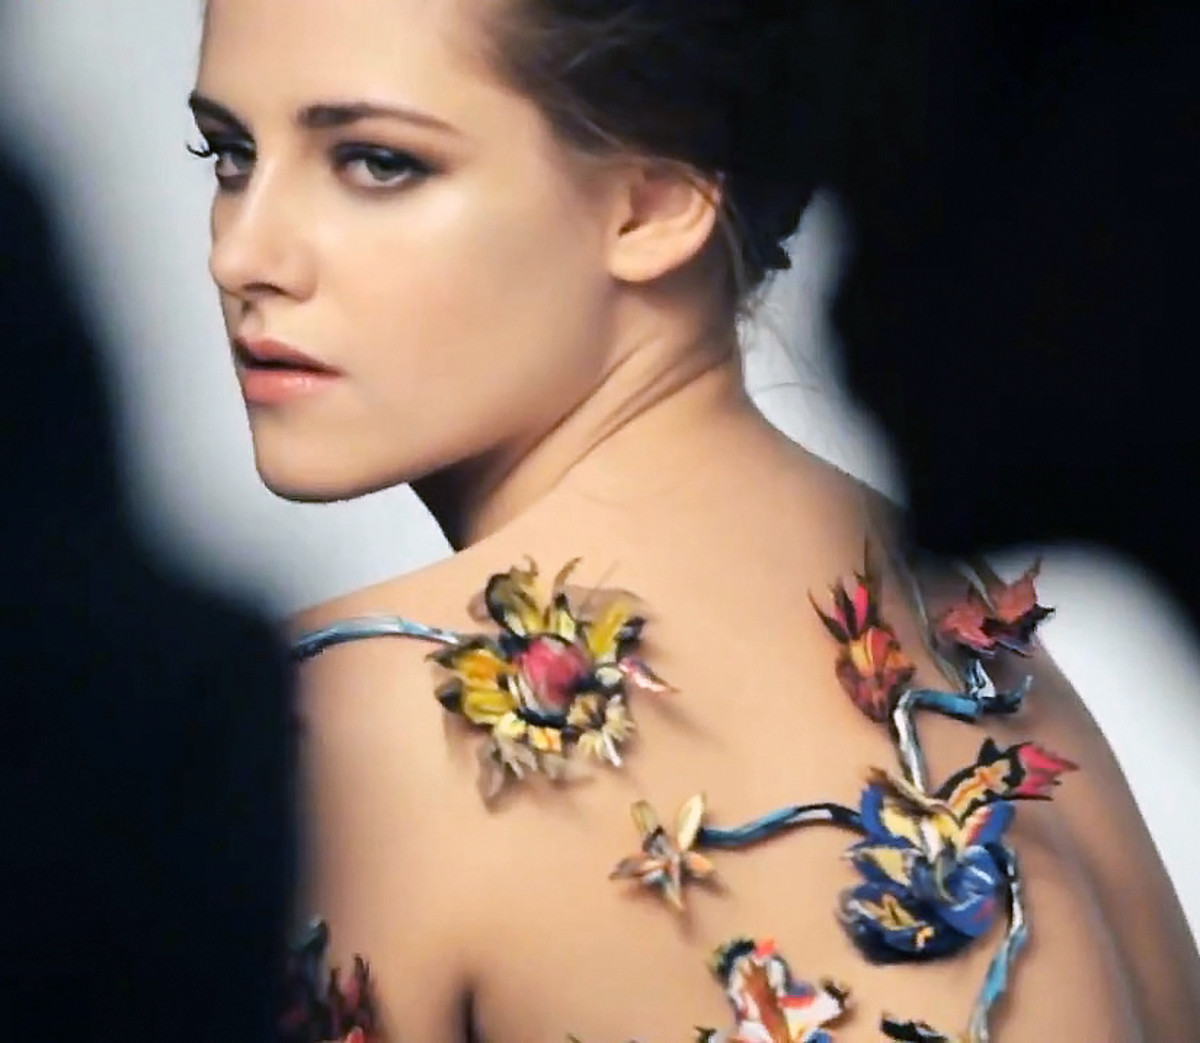 Kristen Stewart's smoky eyes_Kristen Stewart makeup Balenciaga Rosabotanica the campaign